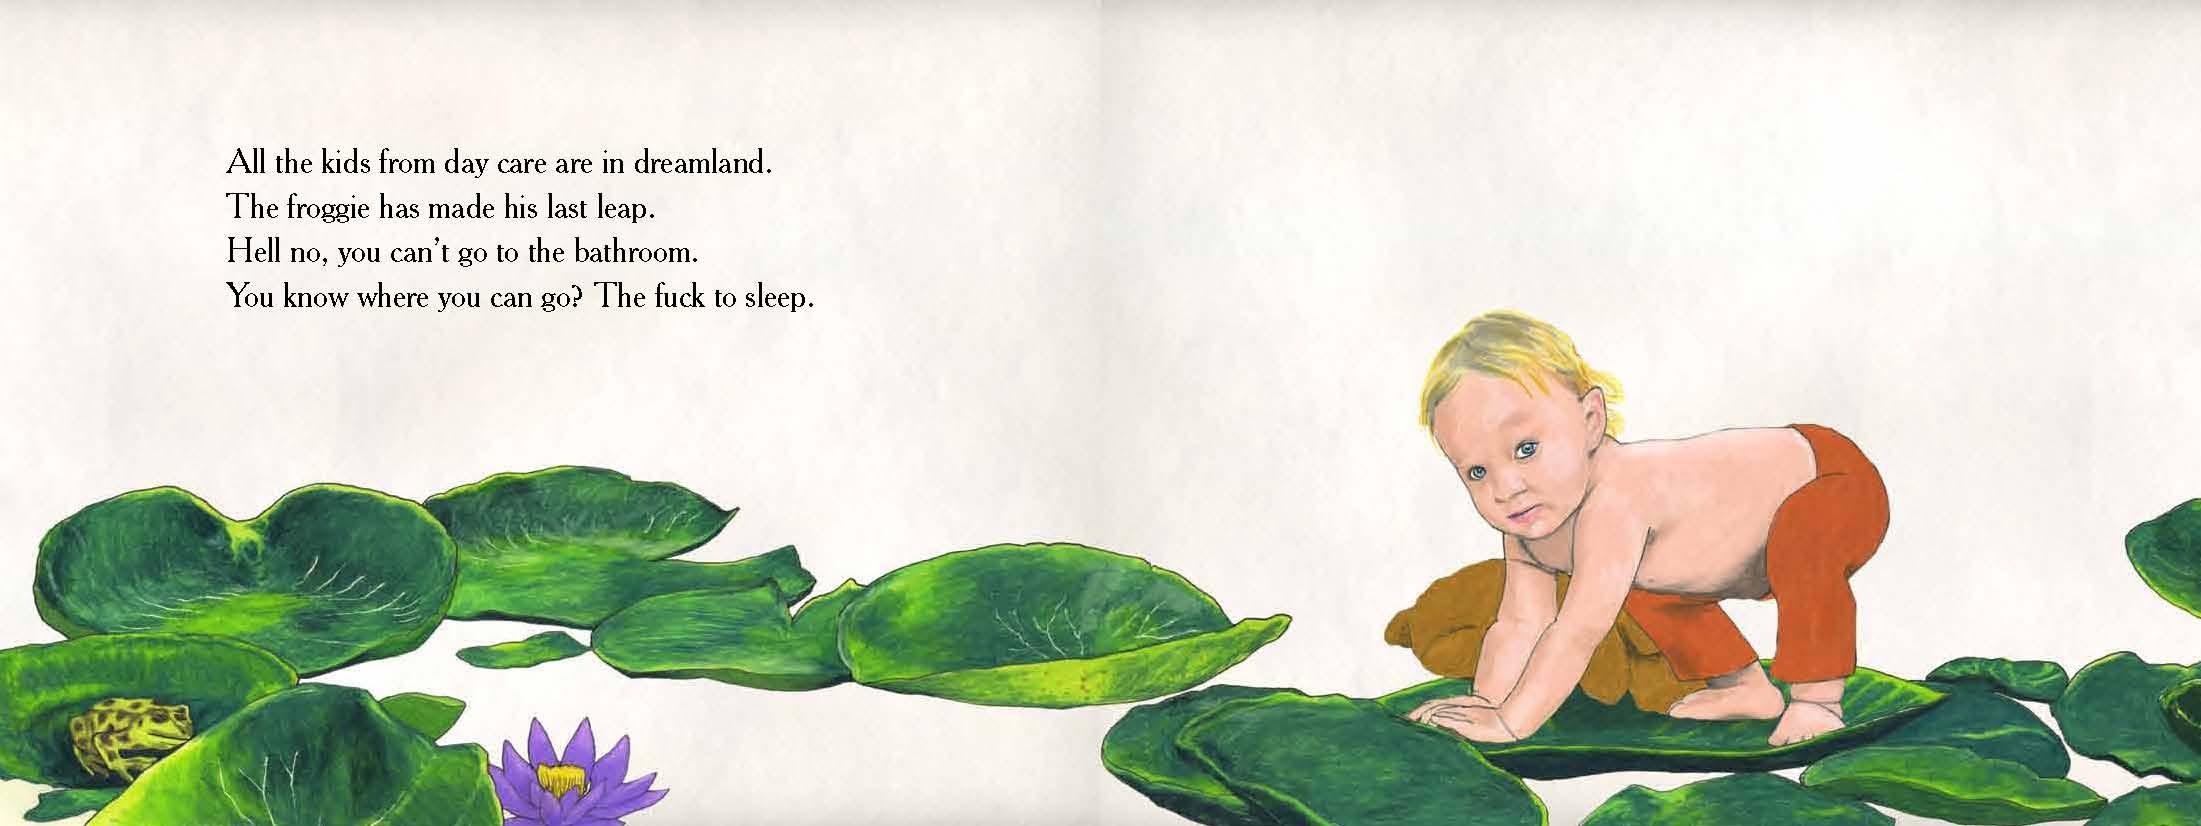 go-the-f-to-sleep_page_08